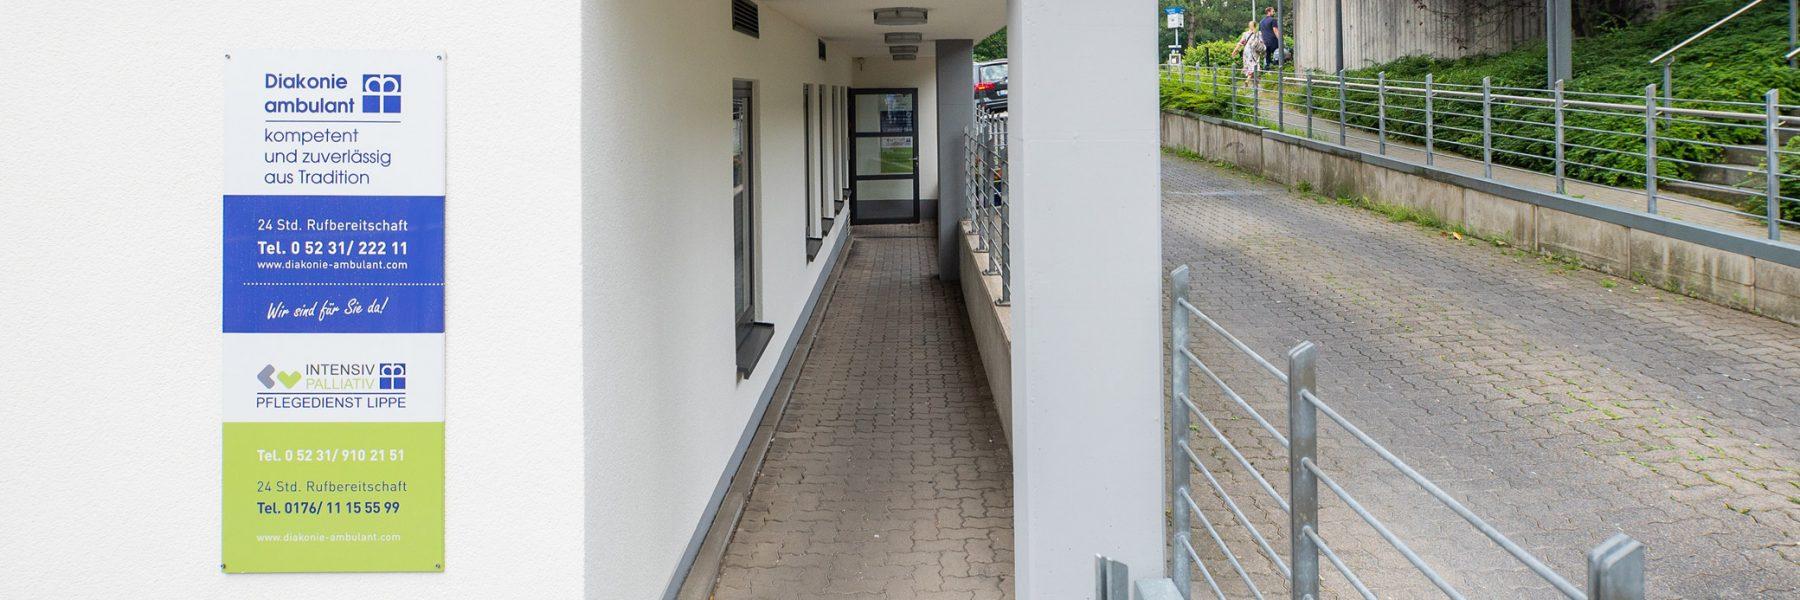 Station Lemgo der Diakonie ambulant